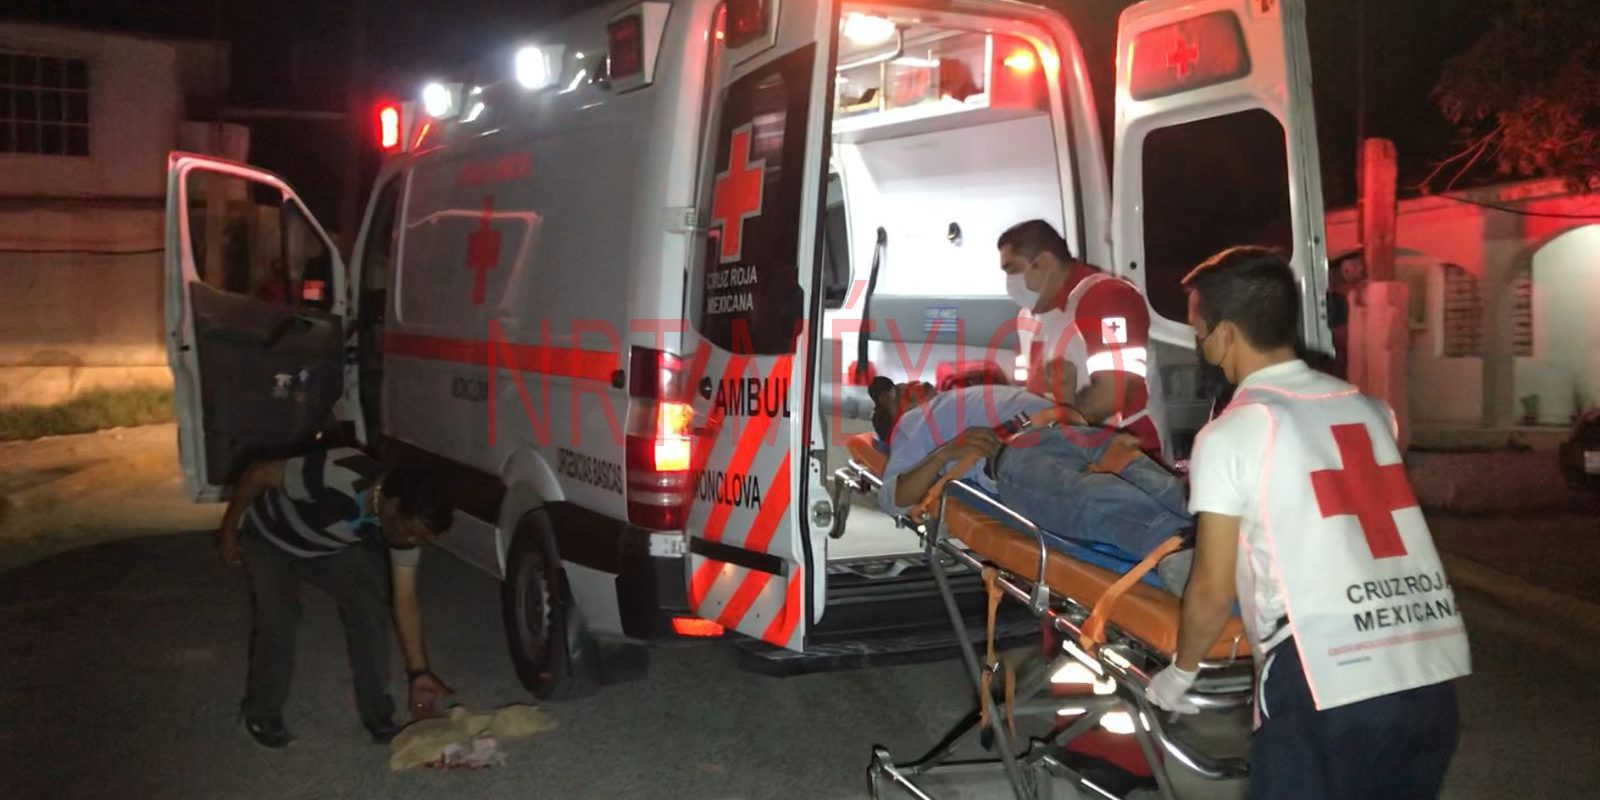 Drogadicto golpea a Luismi, lo manda al hospital en Monclova